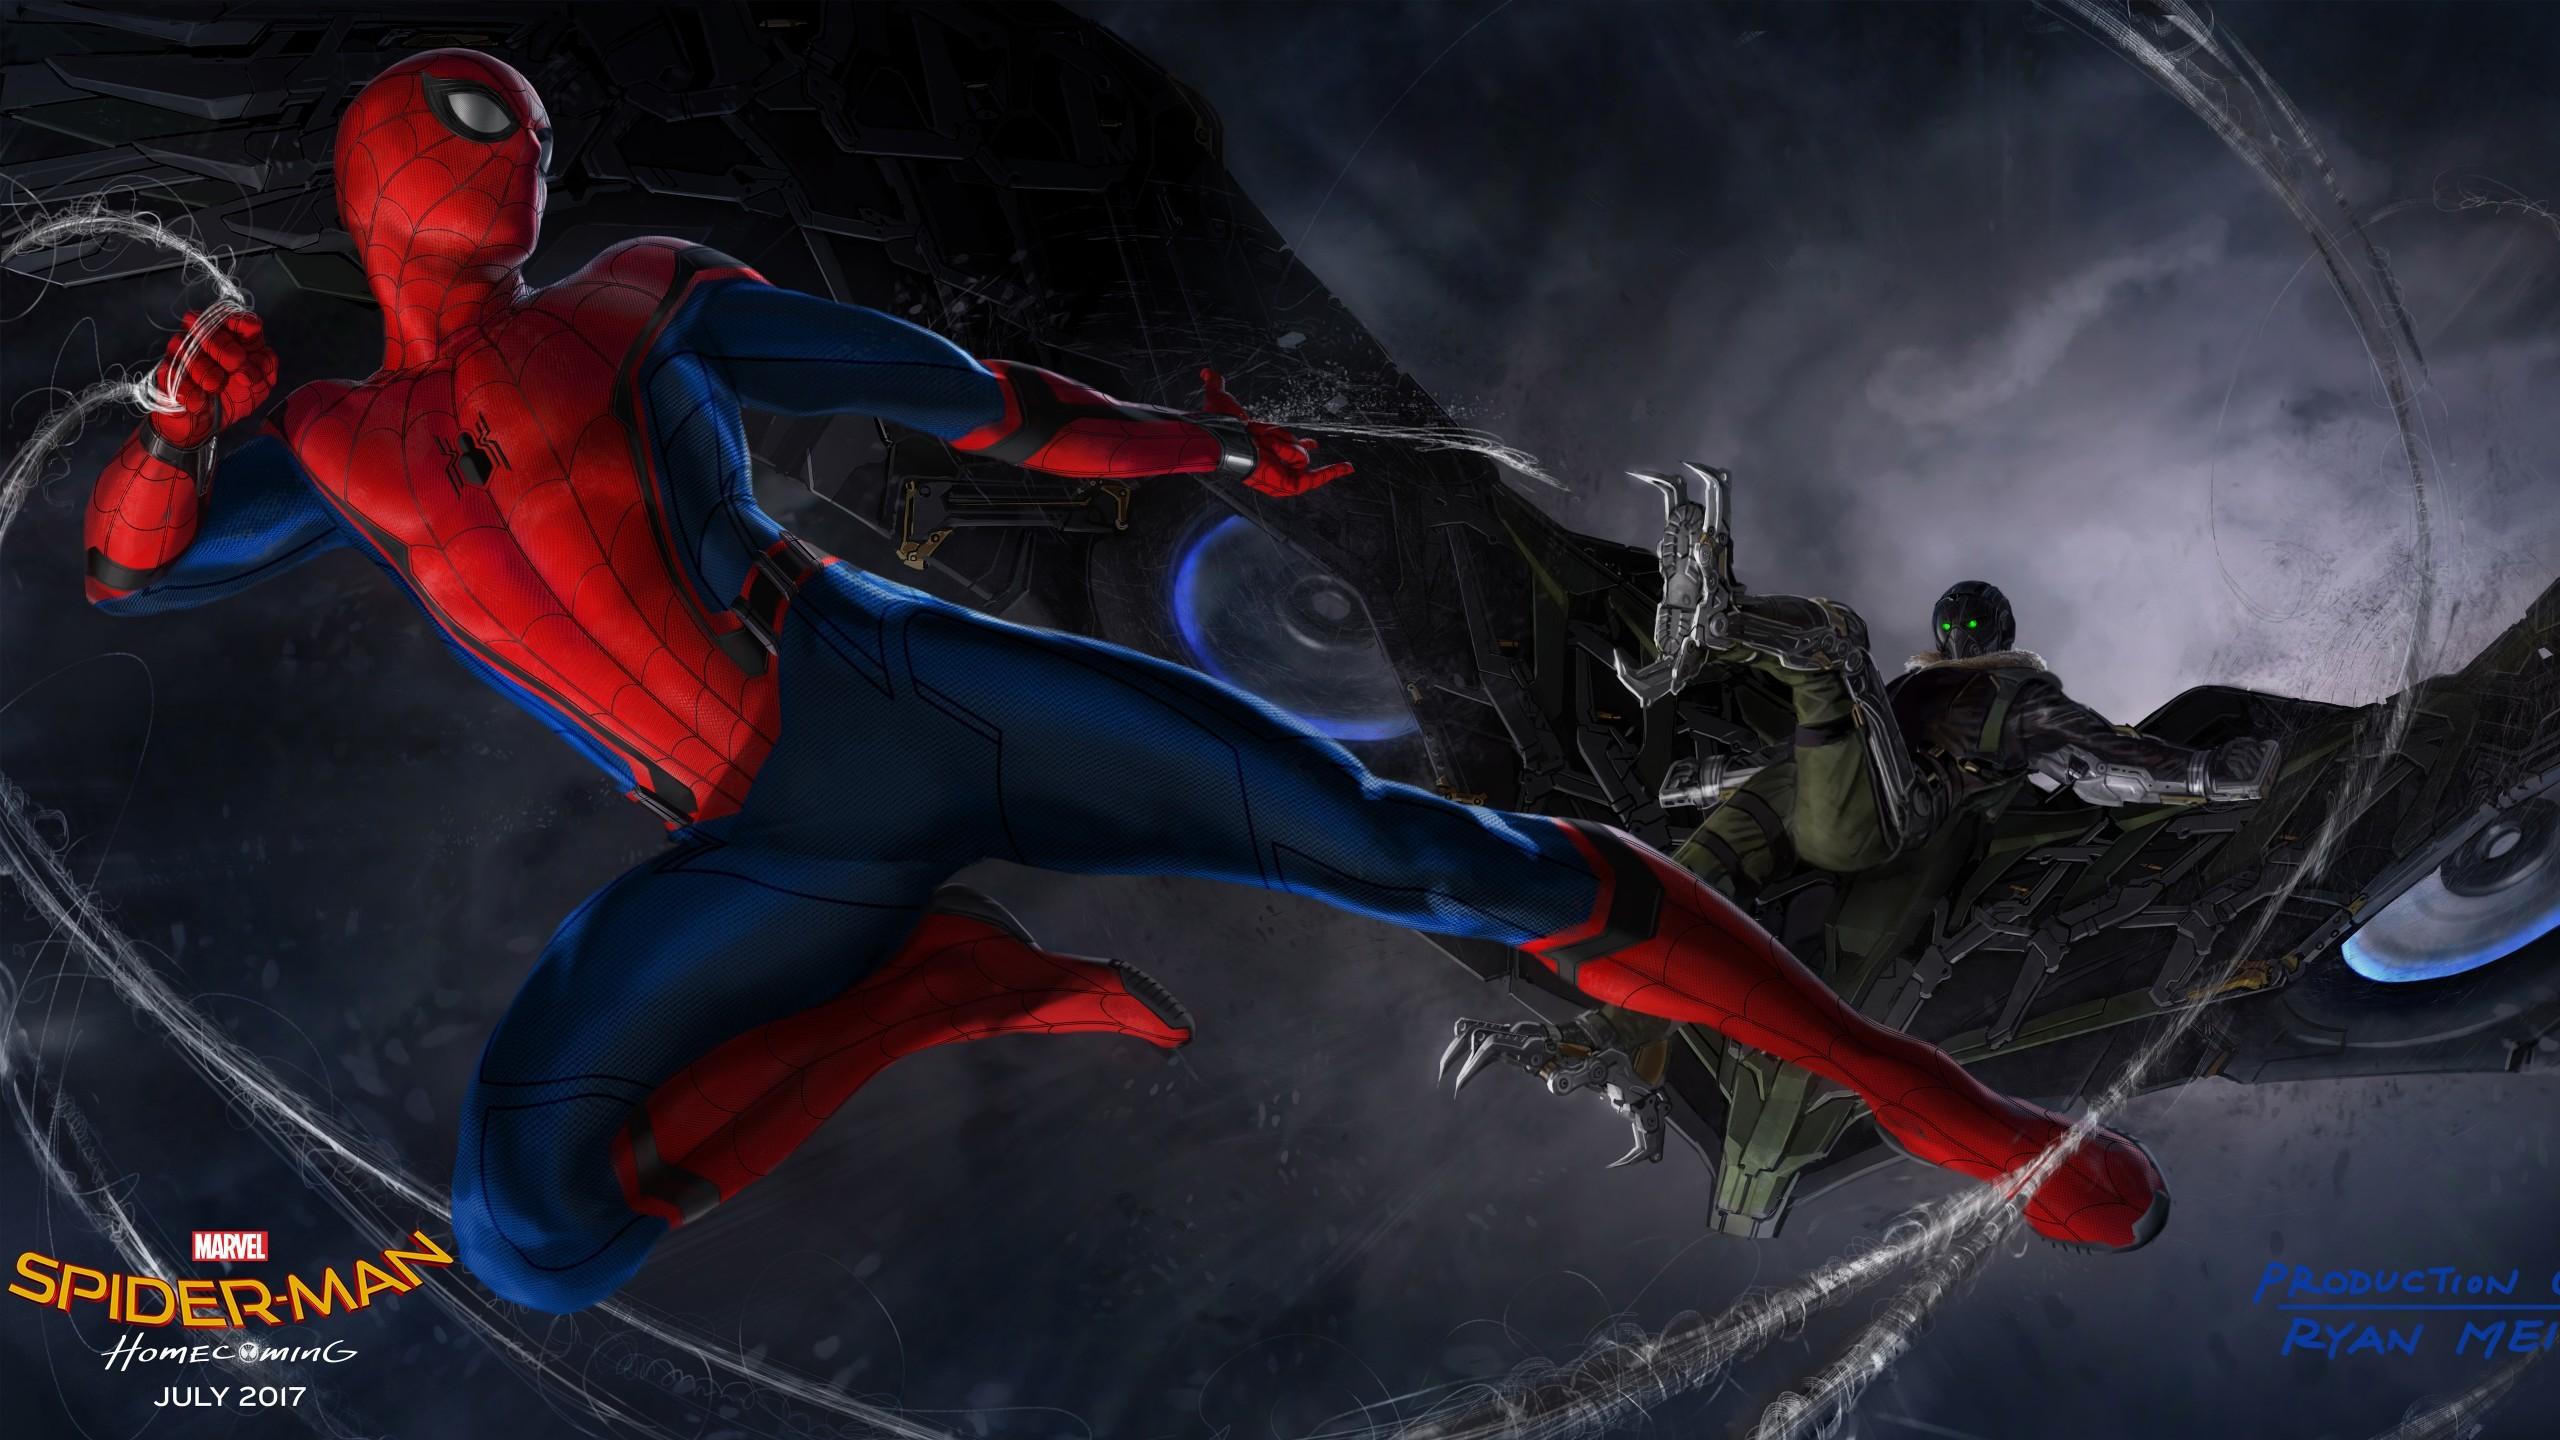 Movies / Spider-Man: Homecoming Wallpaper